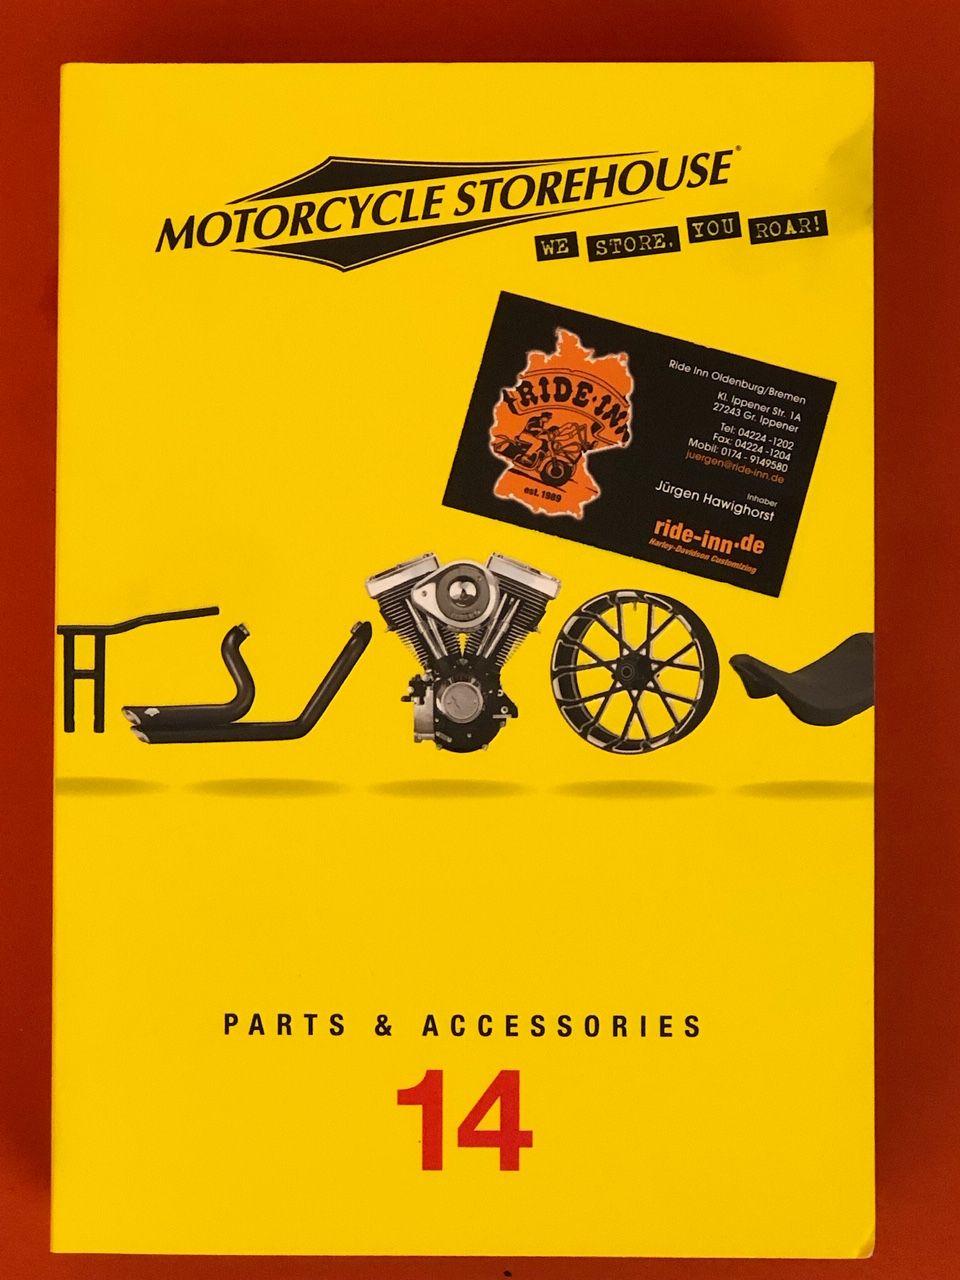 katalog Motorcycle Storehouse mcs niederlande nl 14 2019